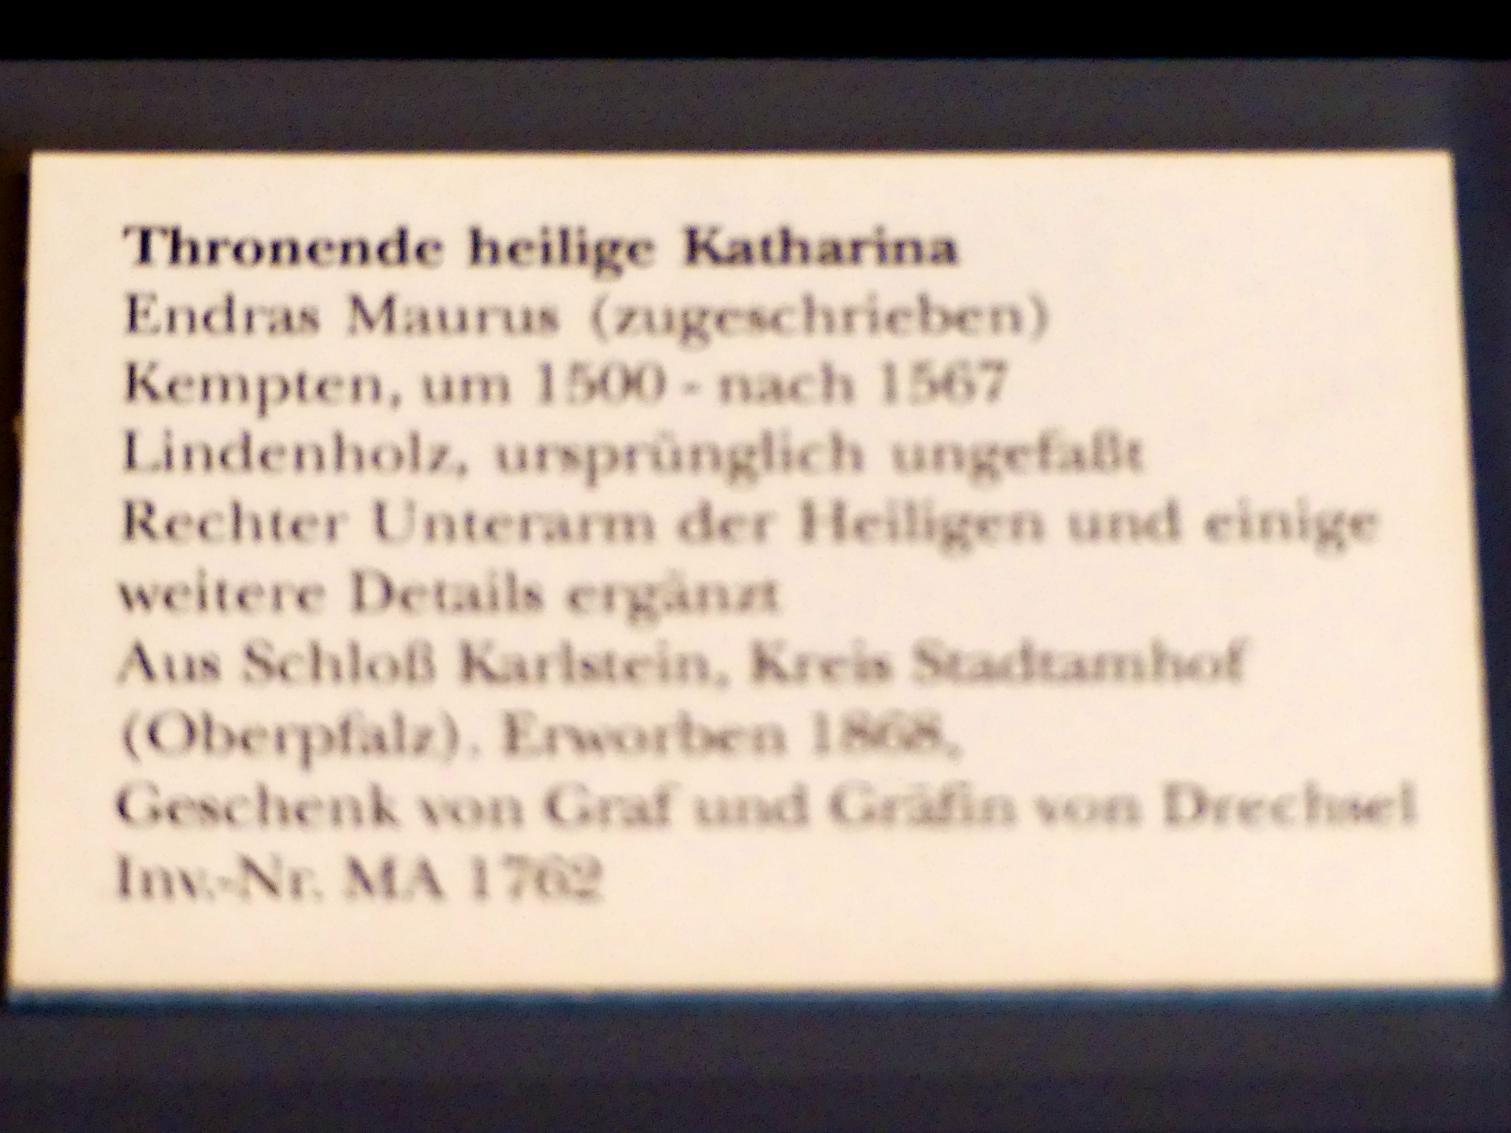 Endras Maurus: Thronende heilige Katharina, Undatiert, Bild 2/2